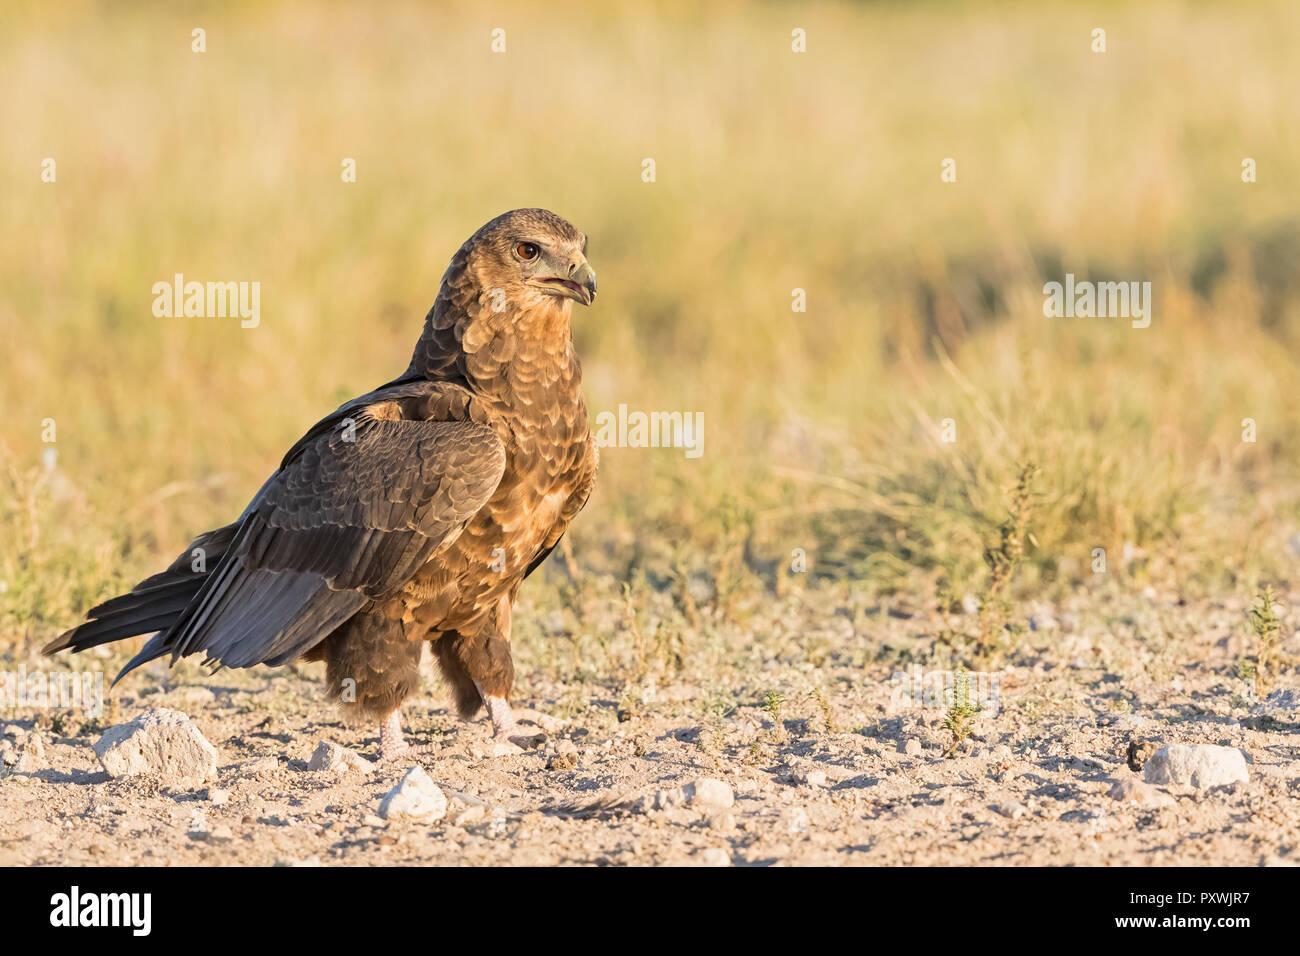 Botswana, Kgalagadi Transfrontier National Park, Mabuasehube Game Reserve, Bataleur eagle, young animal, Terathopius ecaudatus - Stock Image